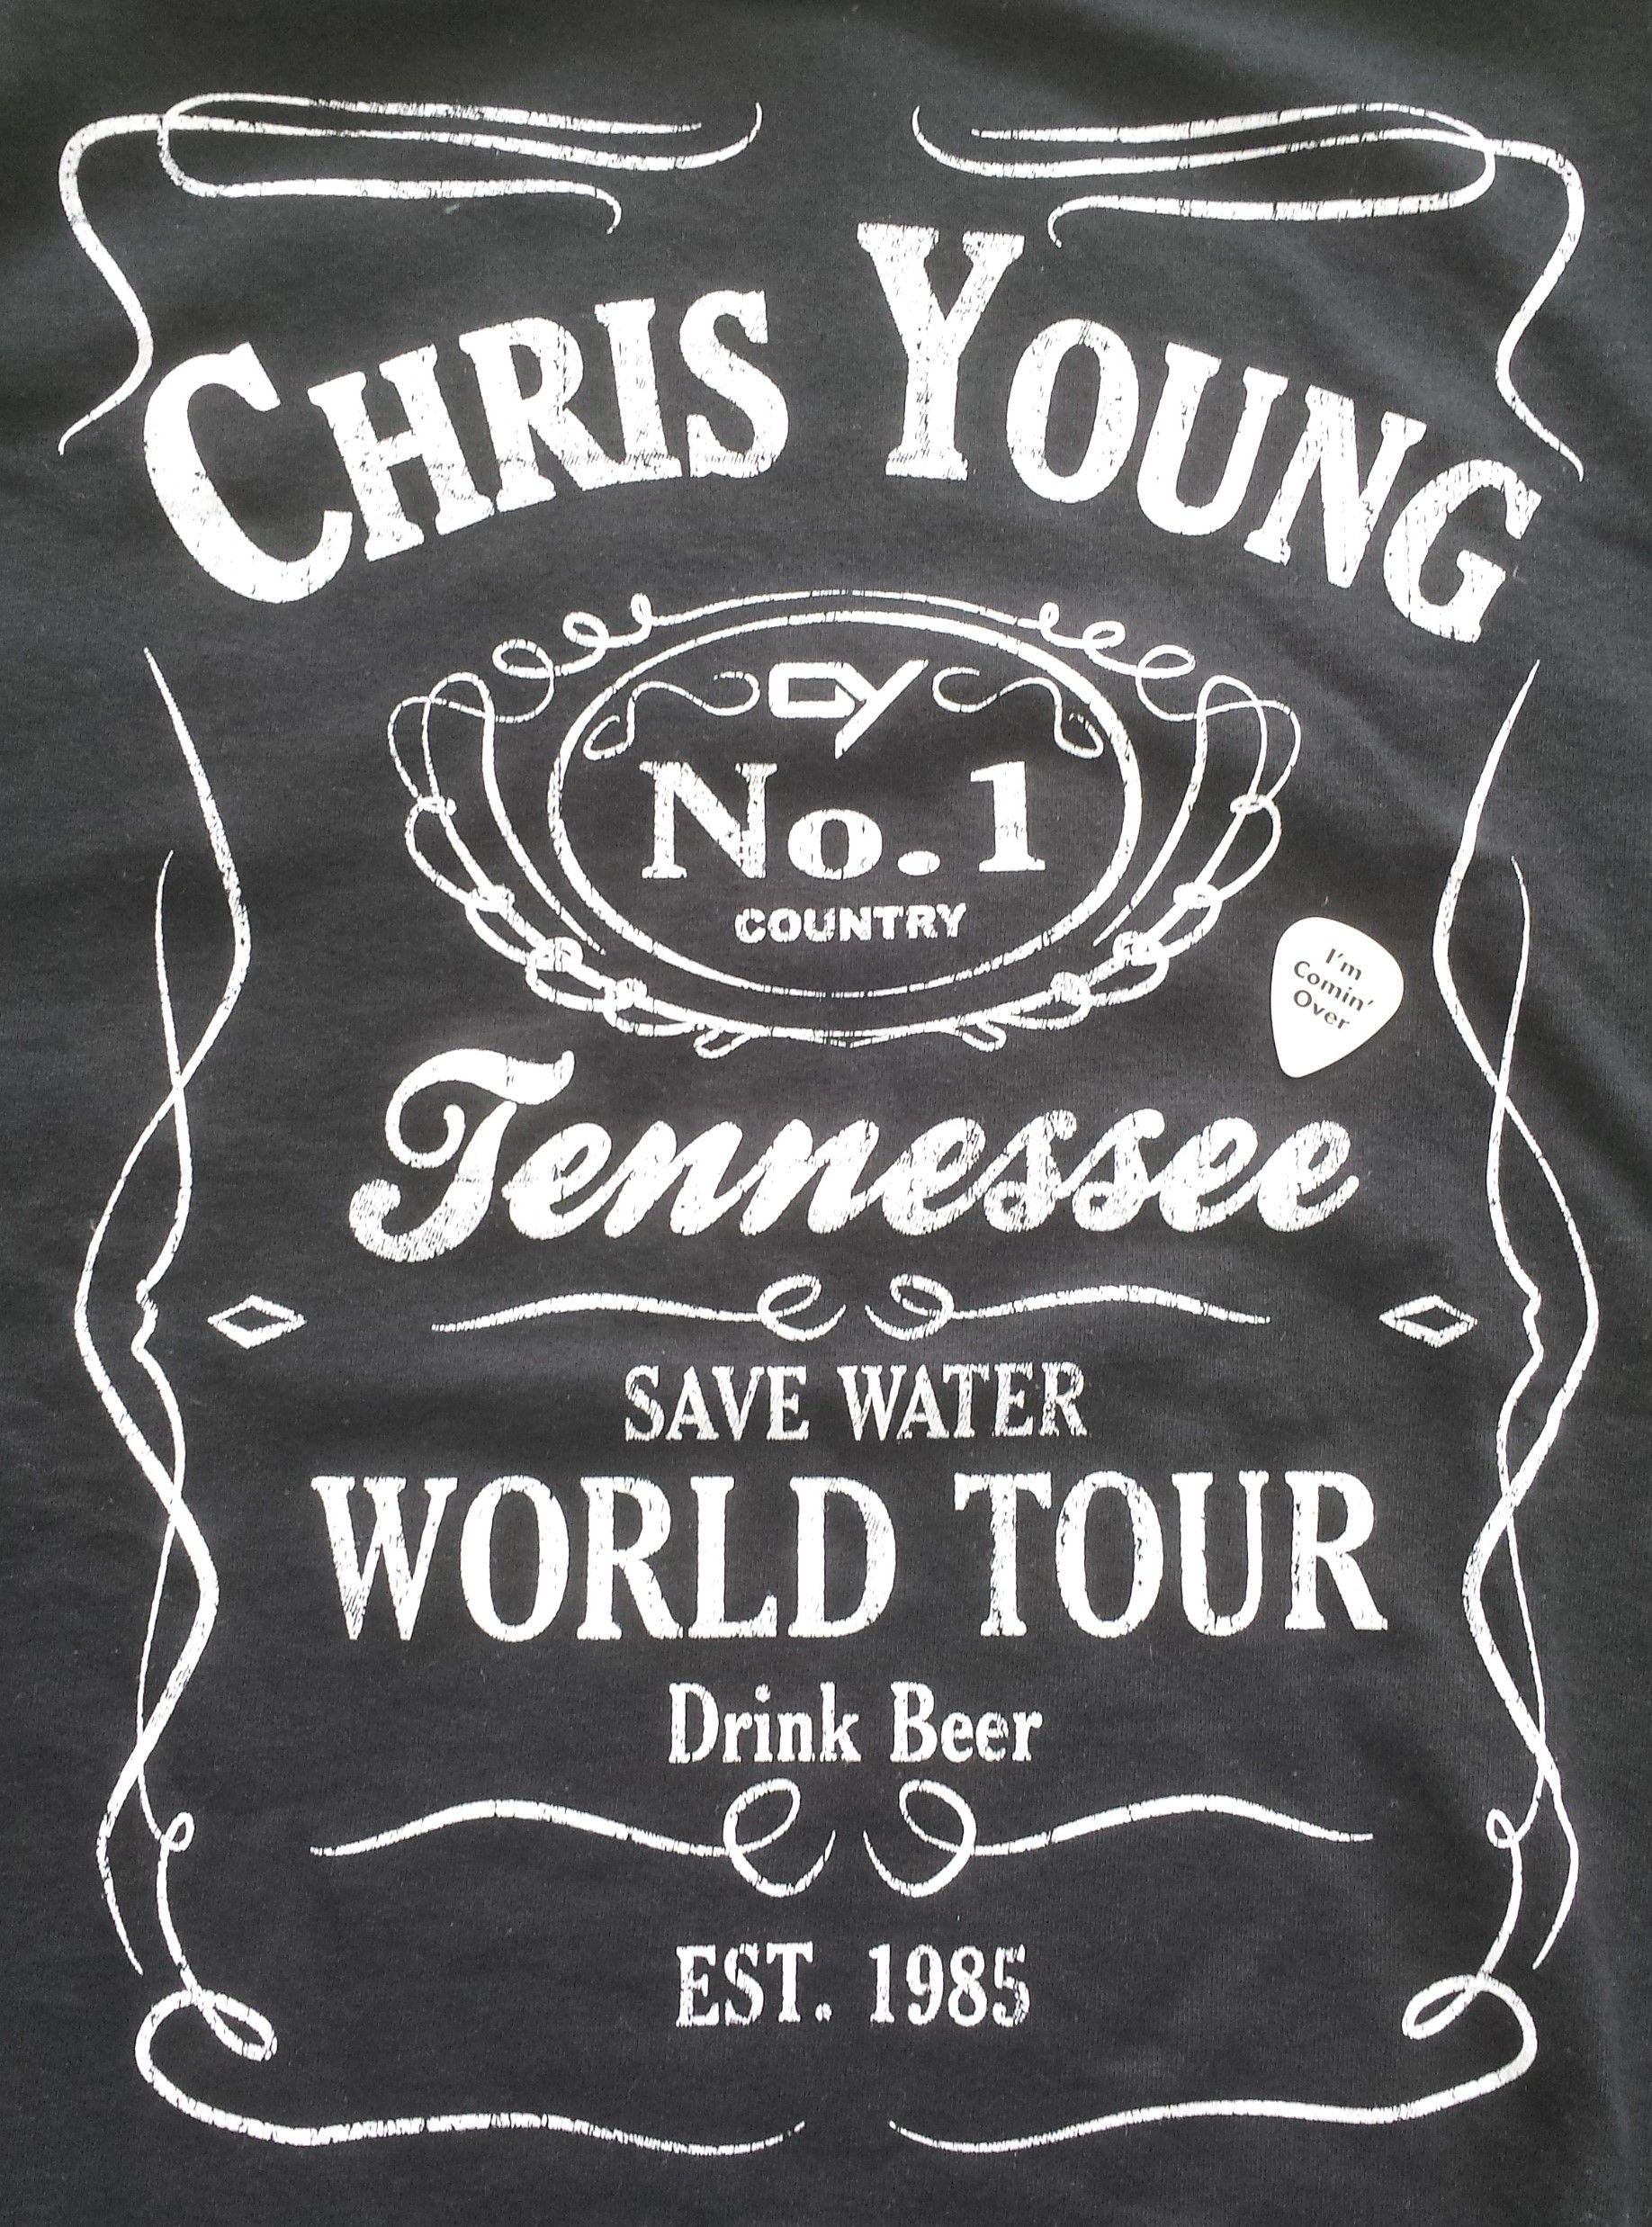 Chris Young A.M. World Tour - Konzert in München ♡